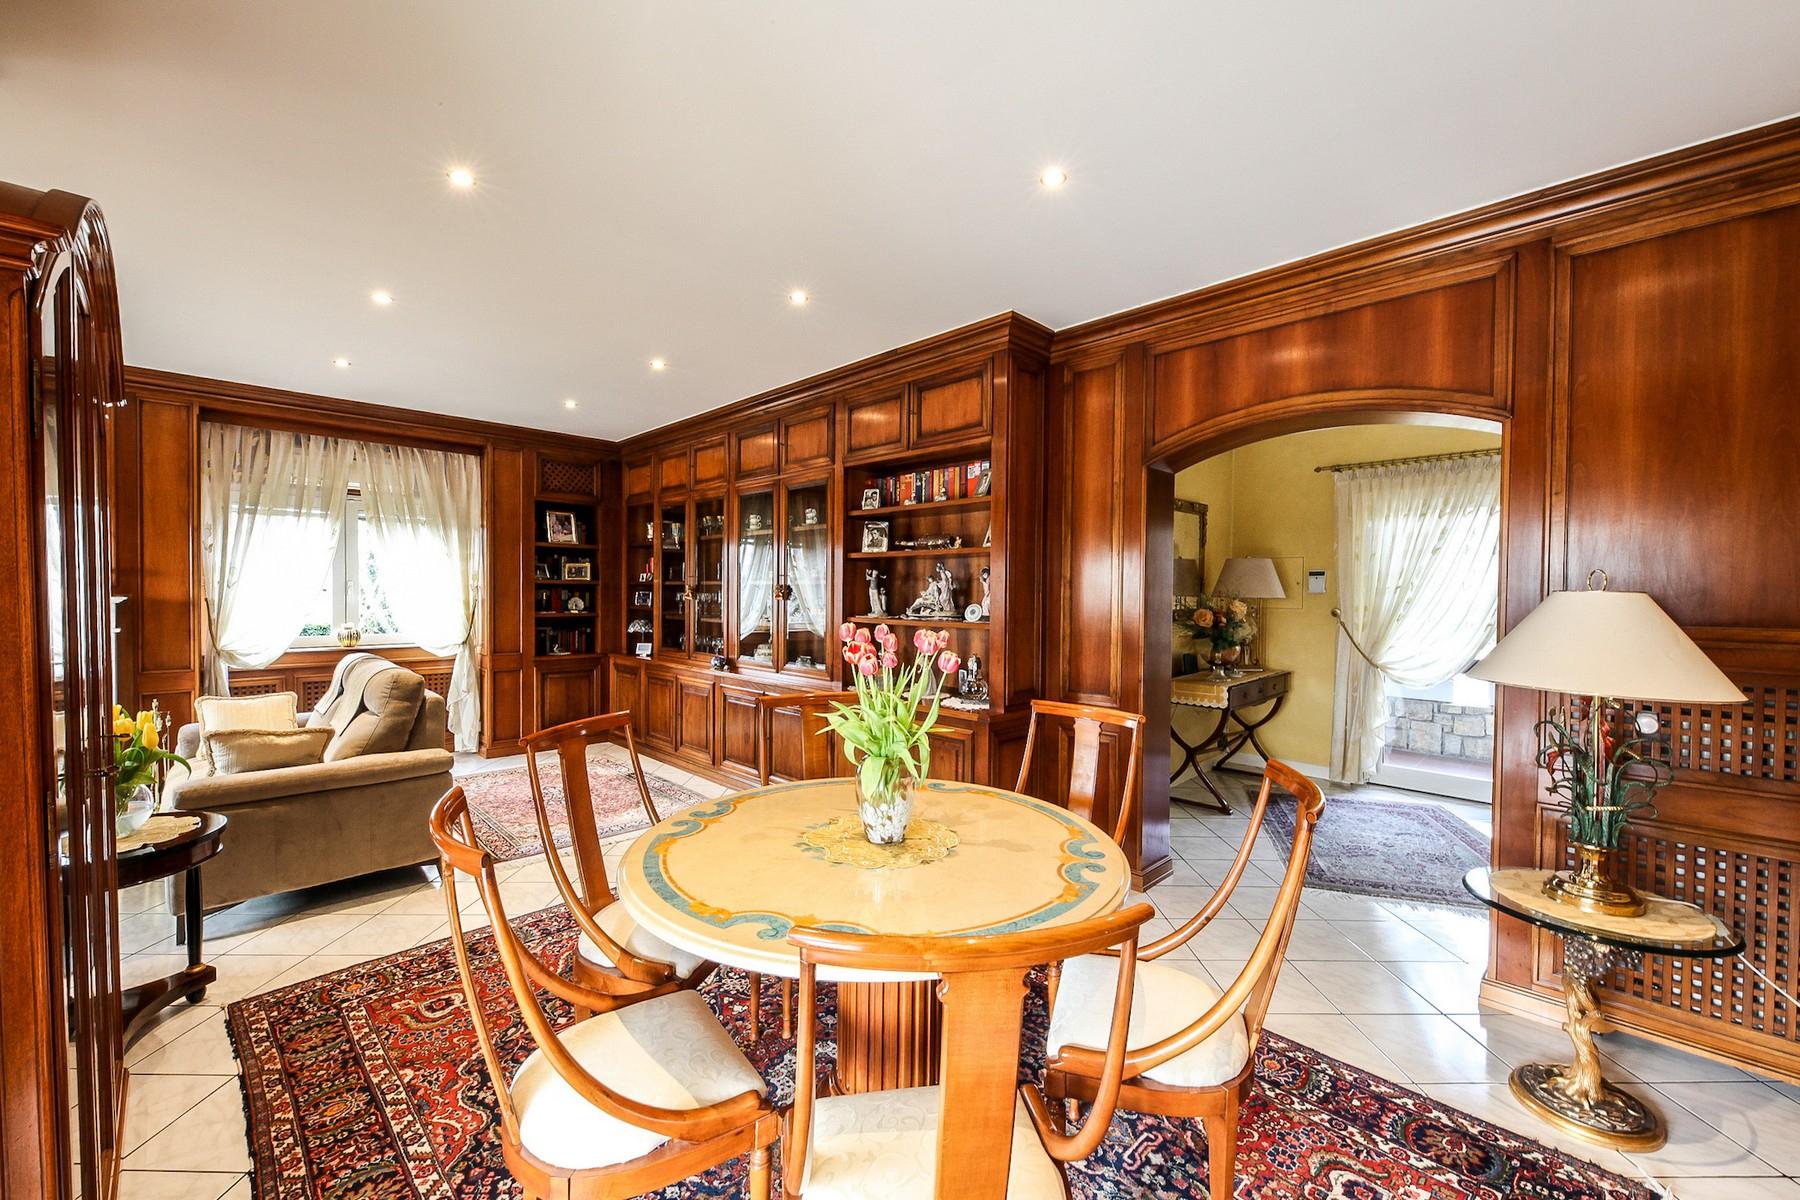 Villa in Vendita a Padenghe Sul Garda: 5 locali, 330 mq - Foto 4